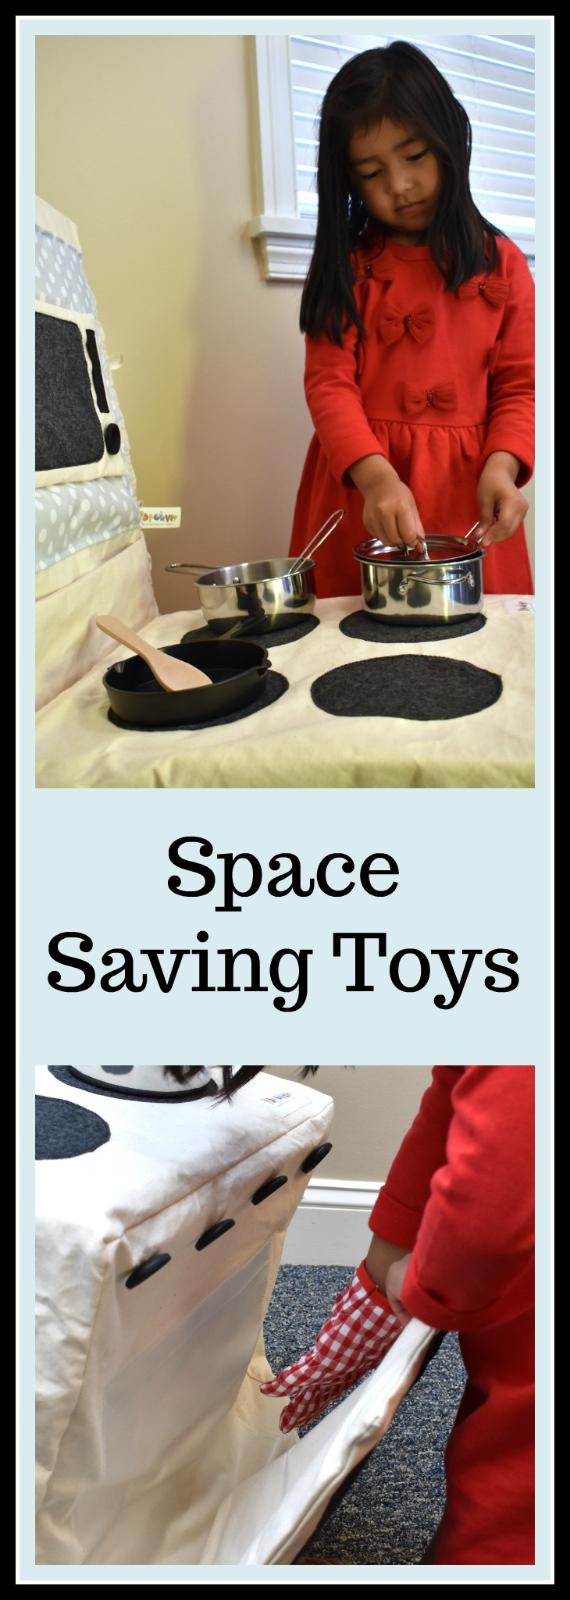 Space Saving Toys